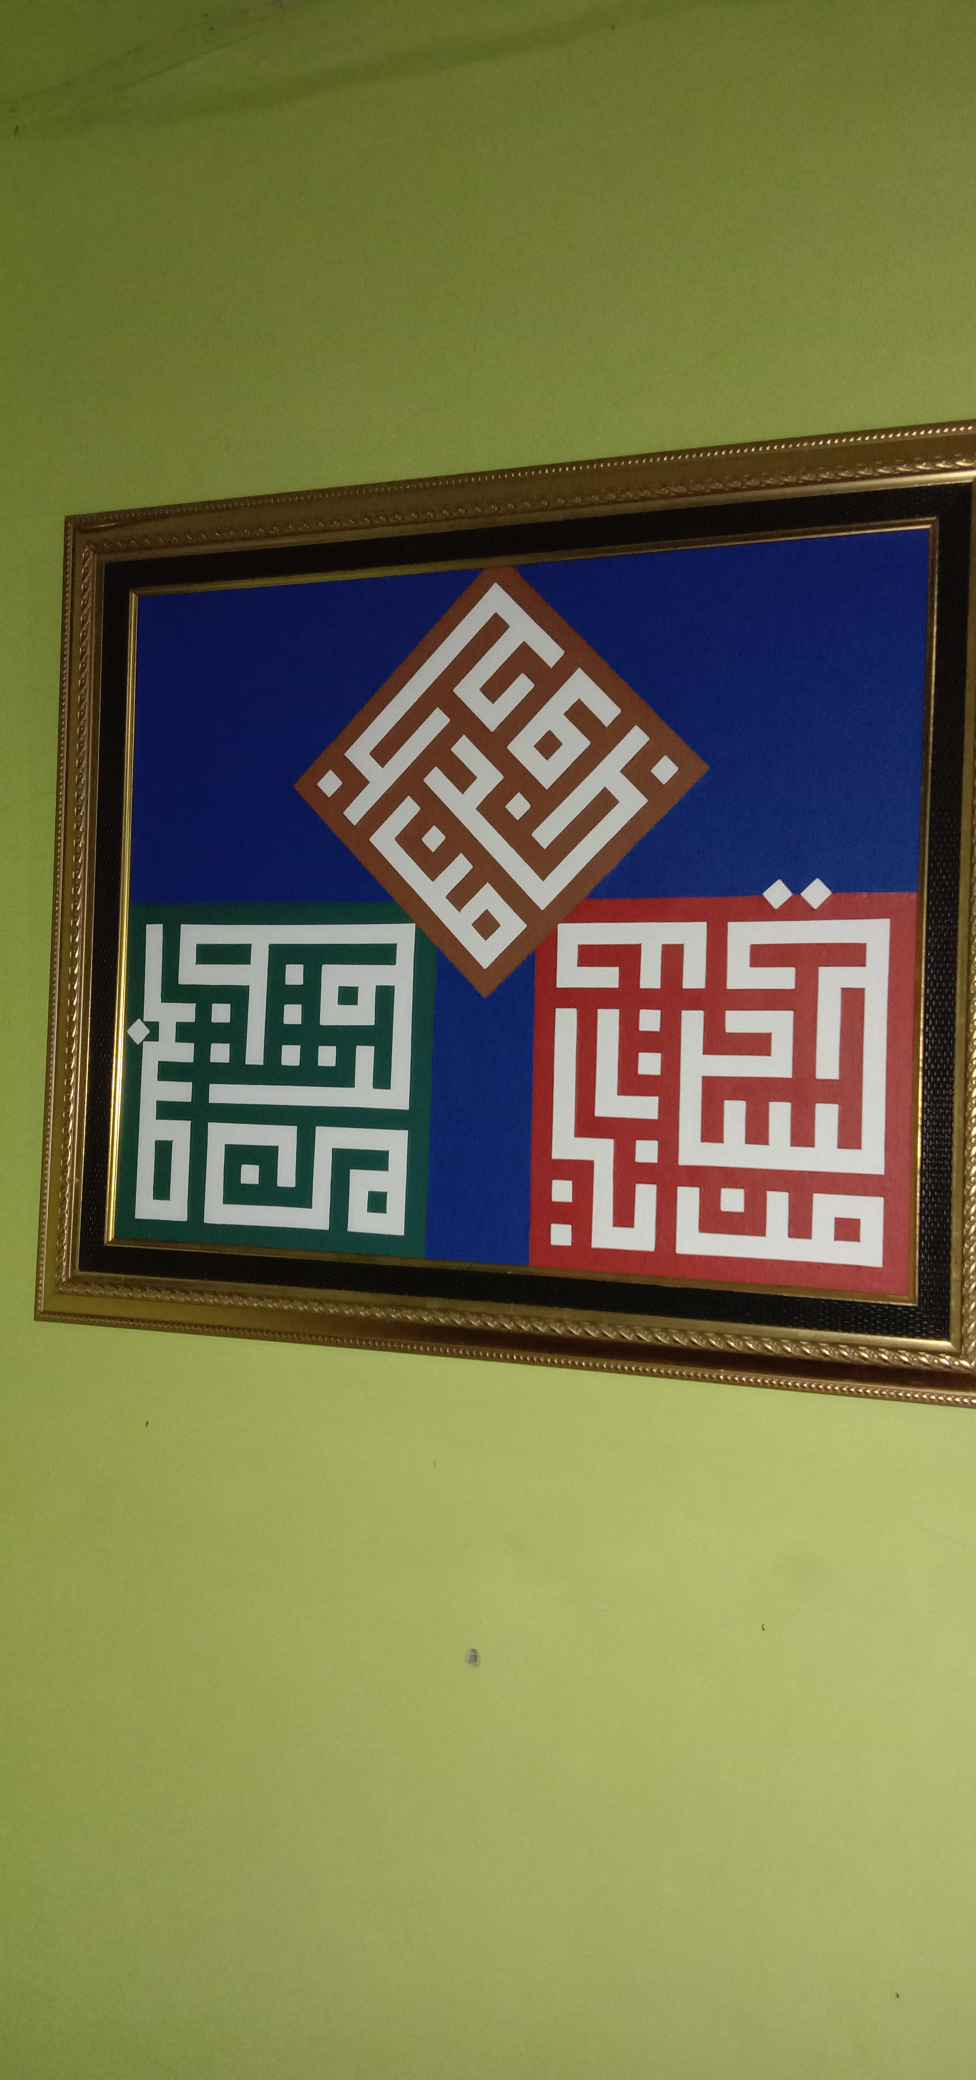 Download Jual kaligrafi spon 1